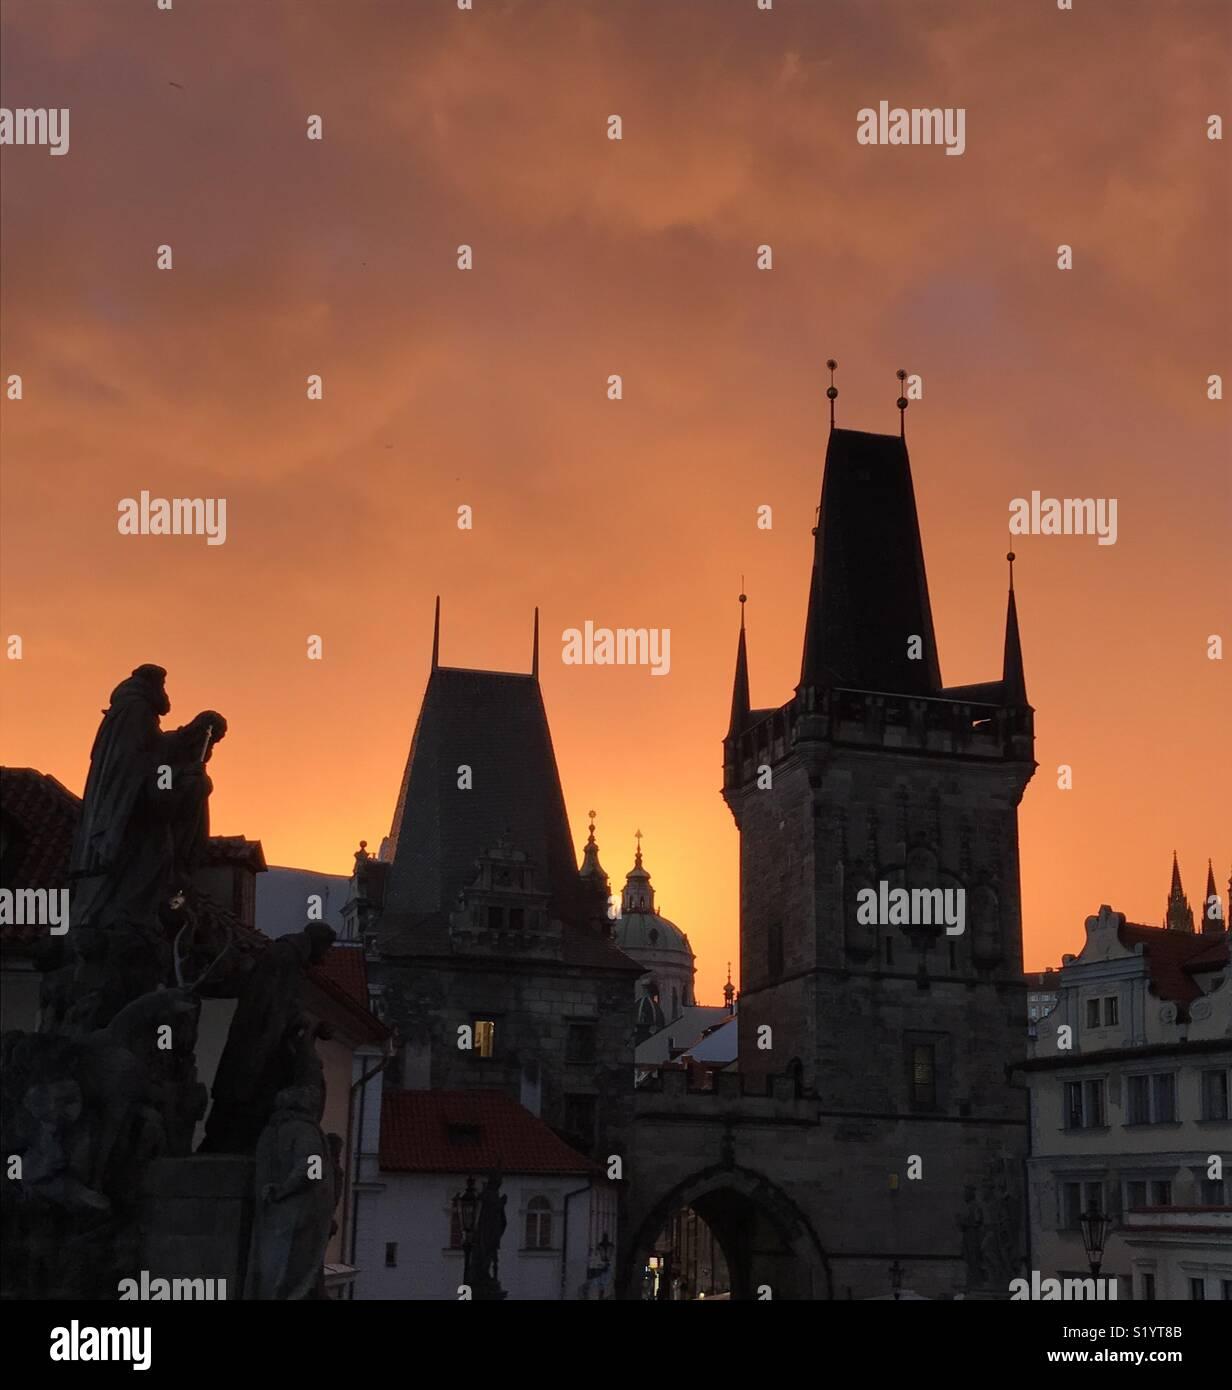 Amazing Sky in prague - Stock Image